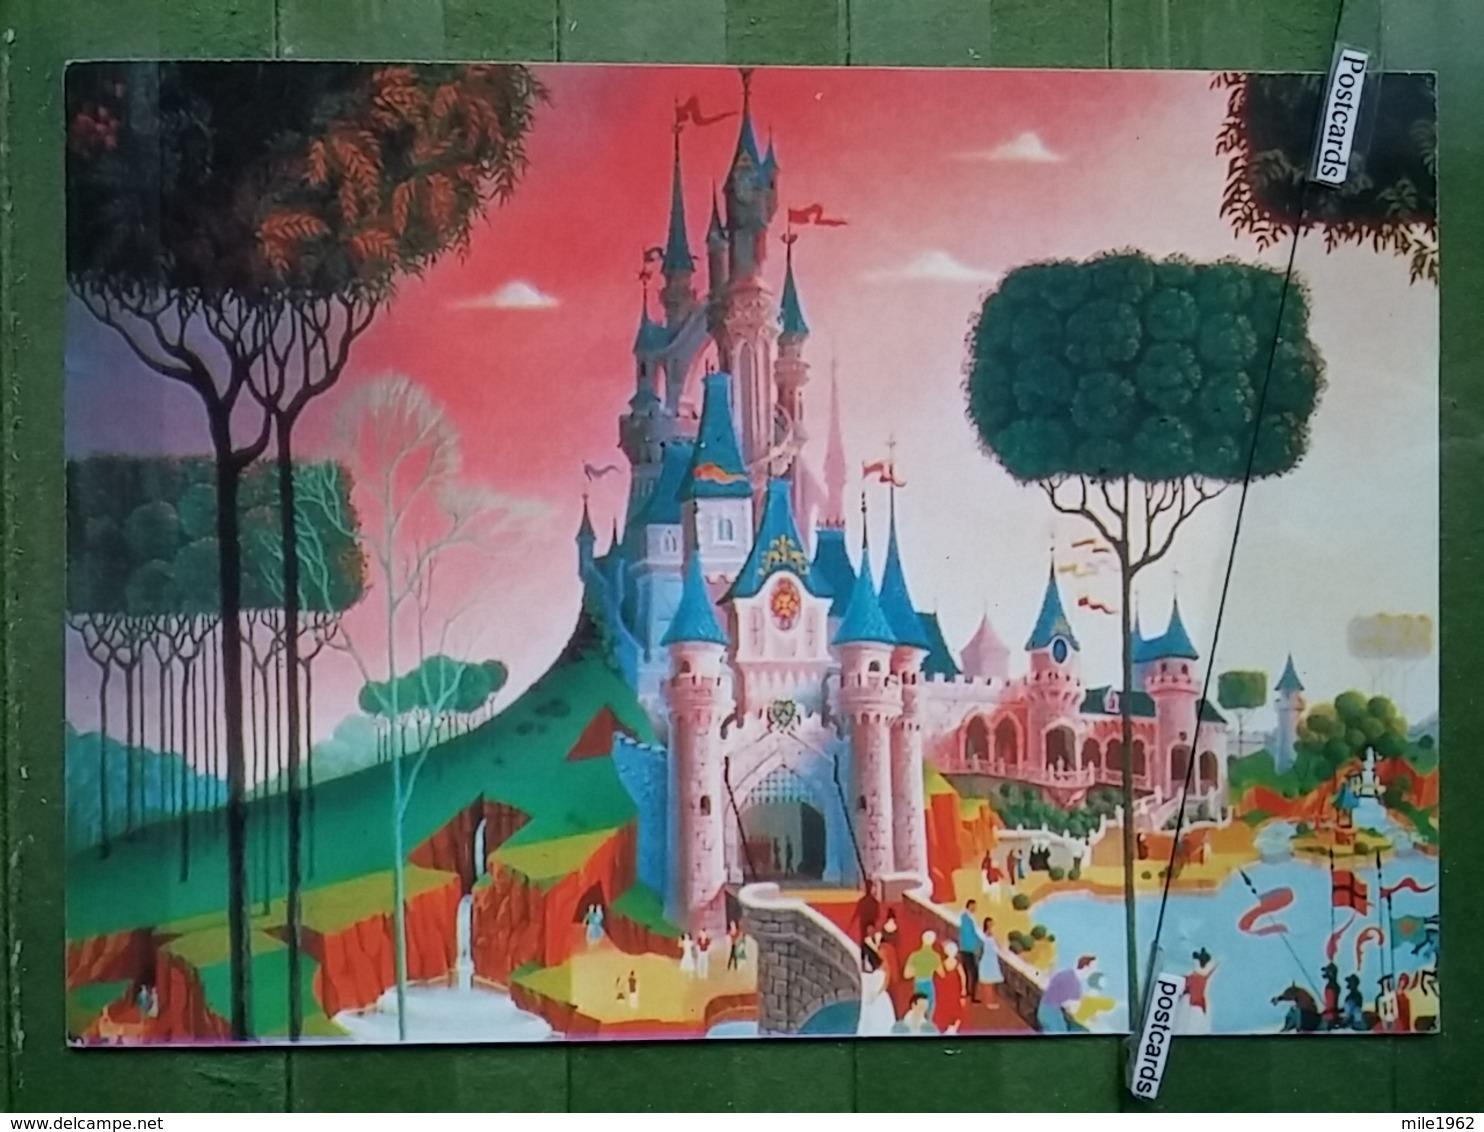 Kov 1148 - Disneyland Paris - Disneyland